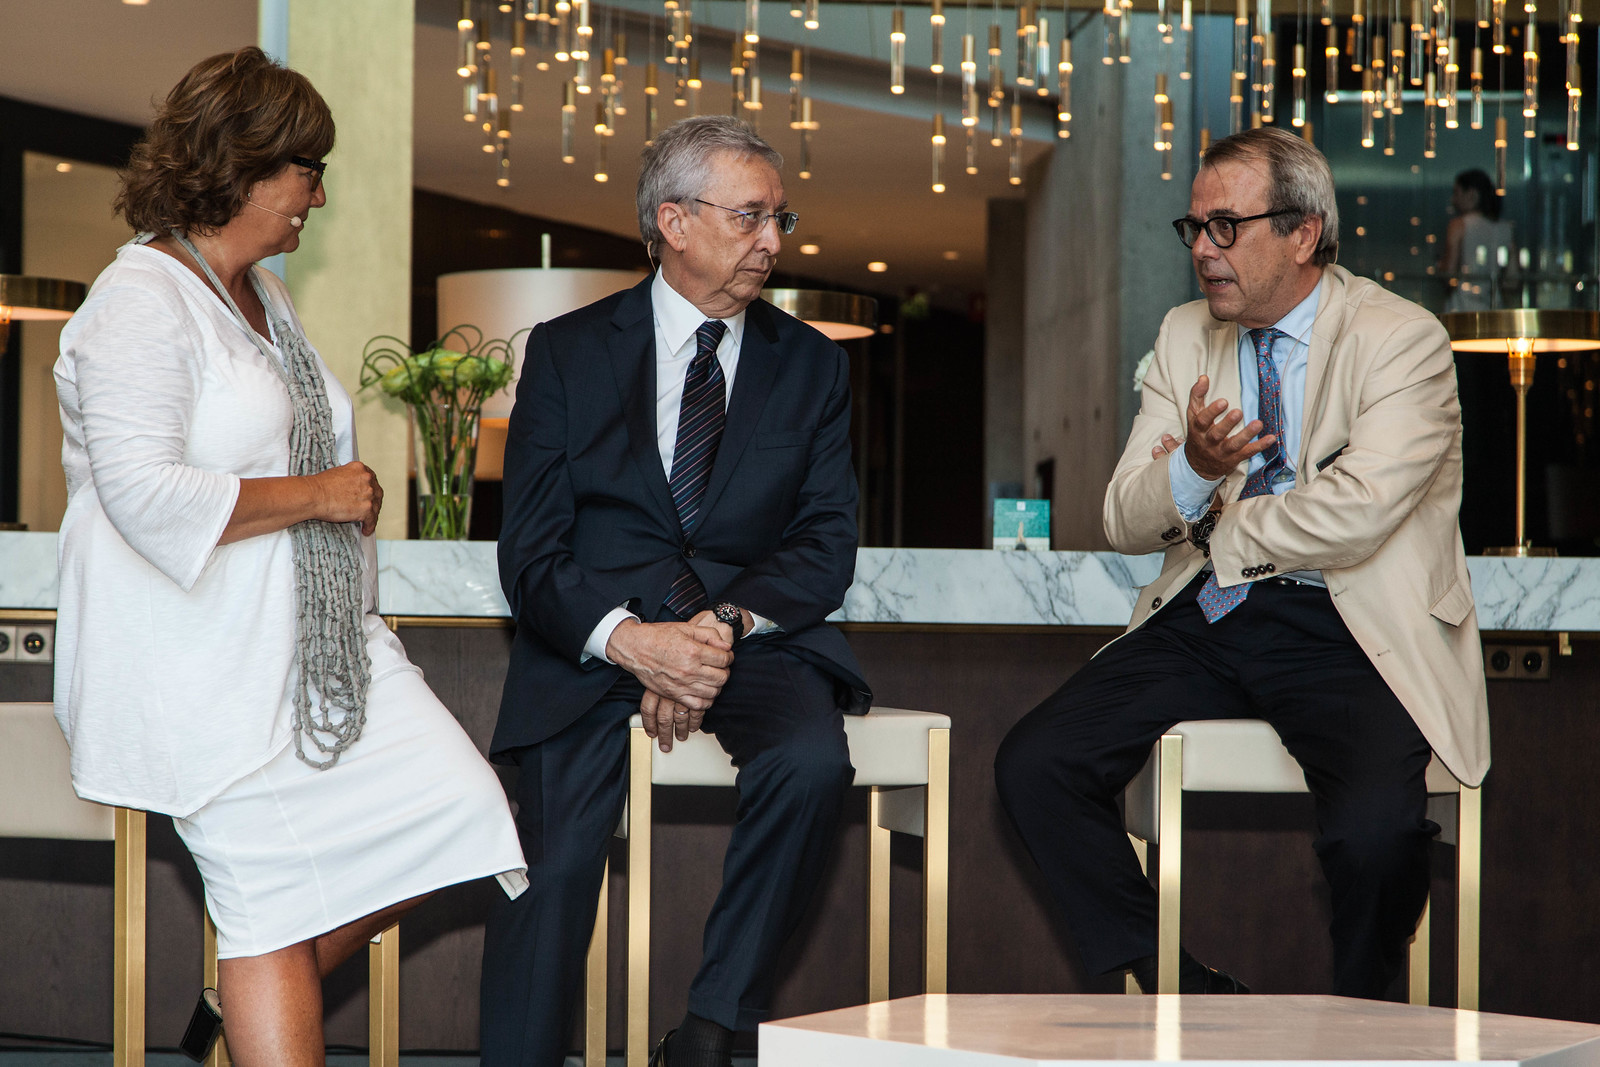 dc., 05/07/2017 - 19:47 - Hotel Rey Juan Carlos - 49